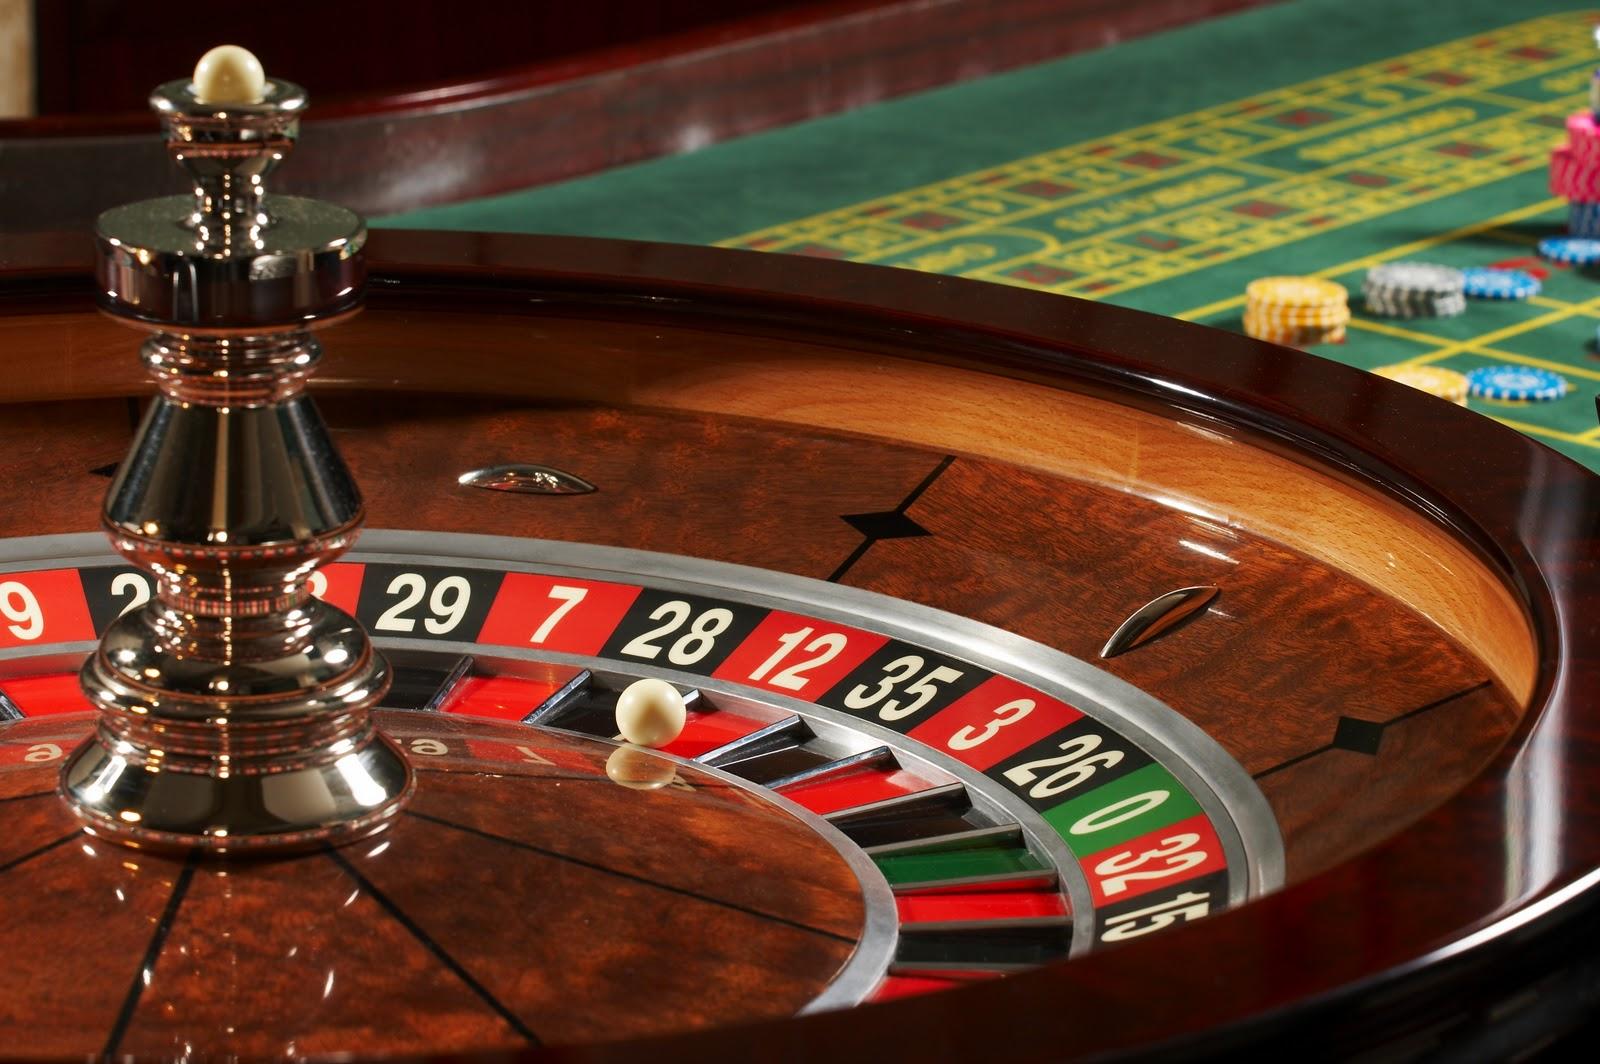 spela casino online on9 games